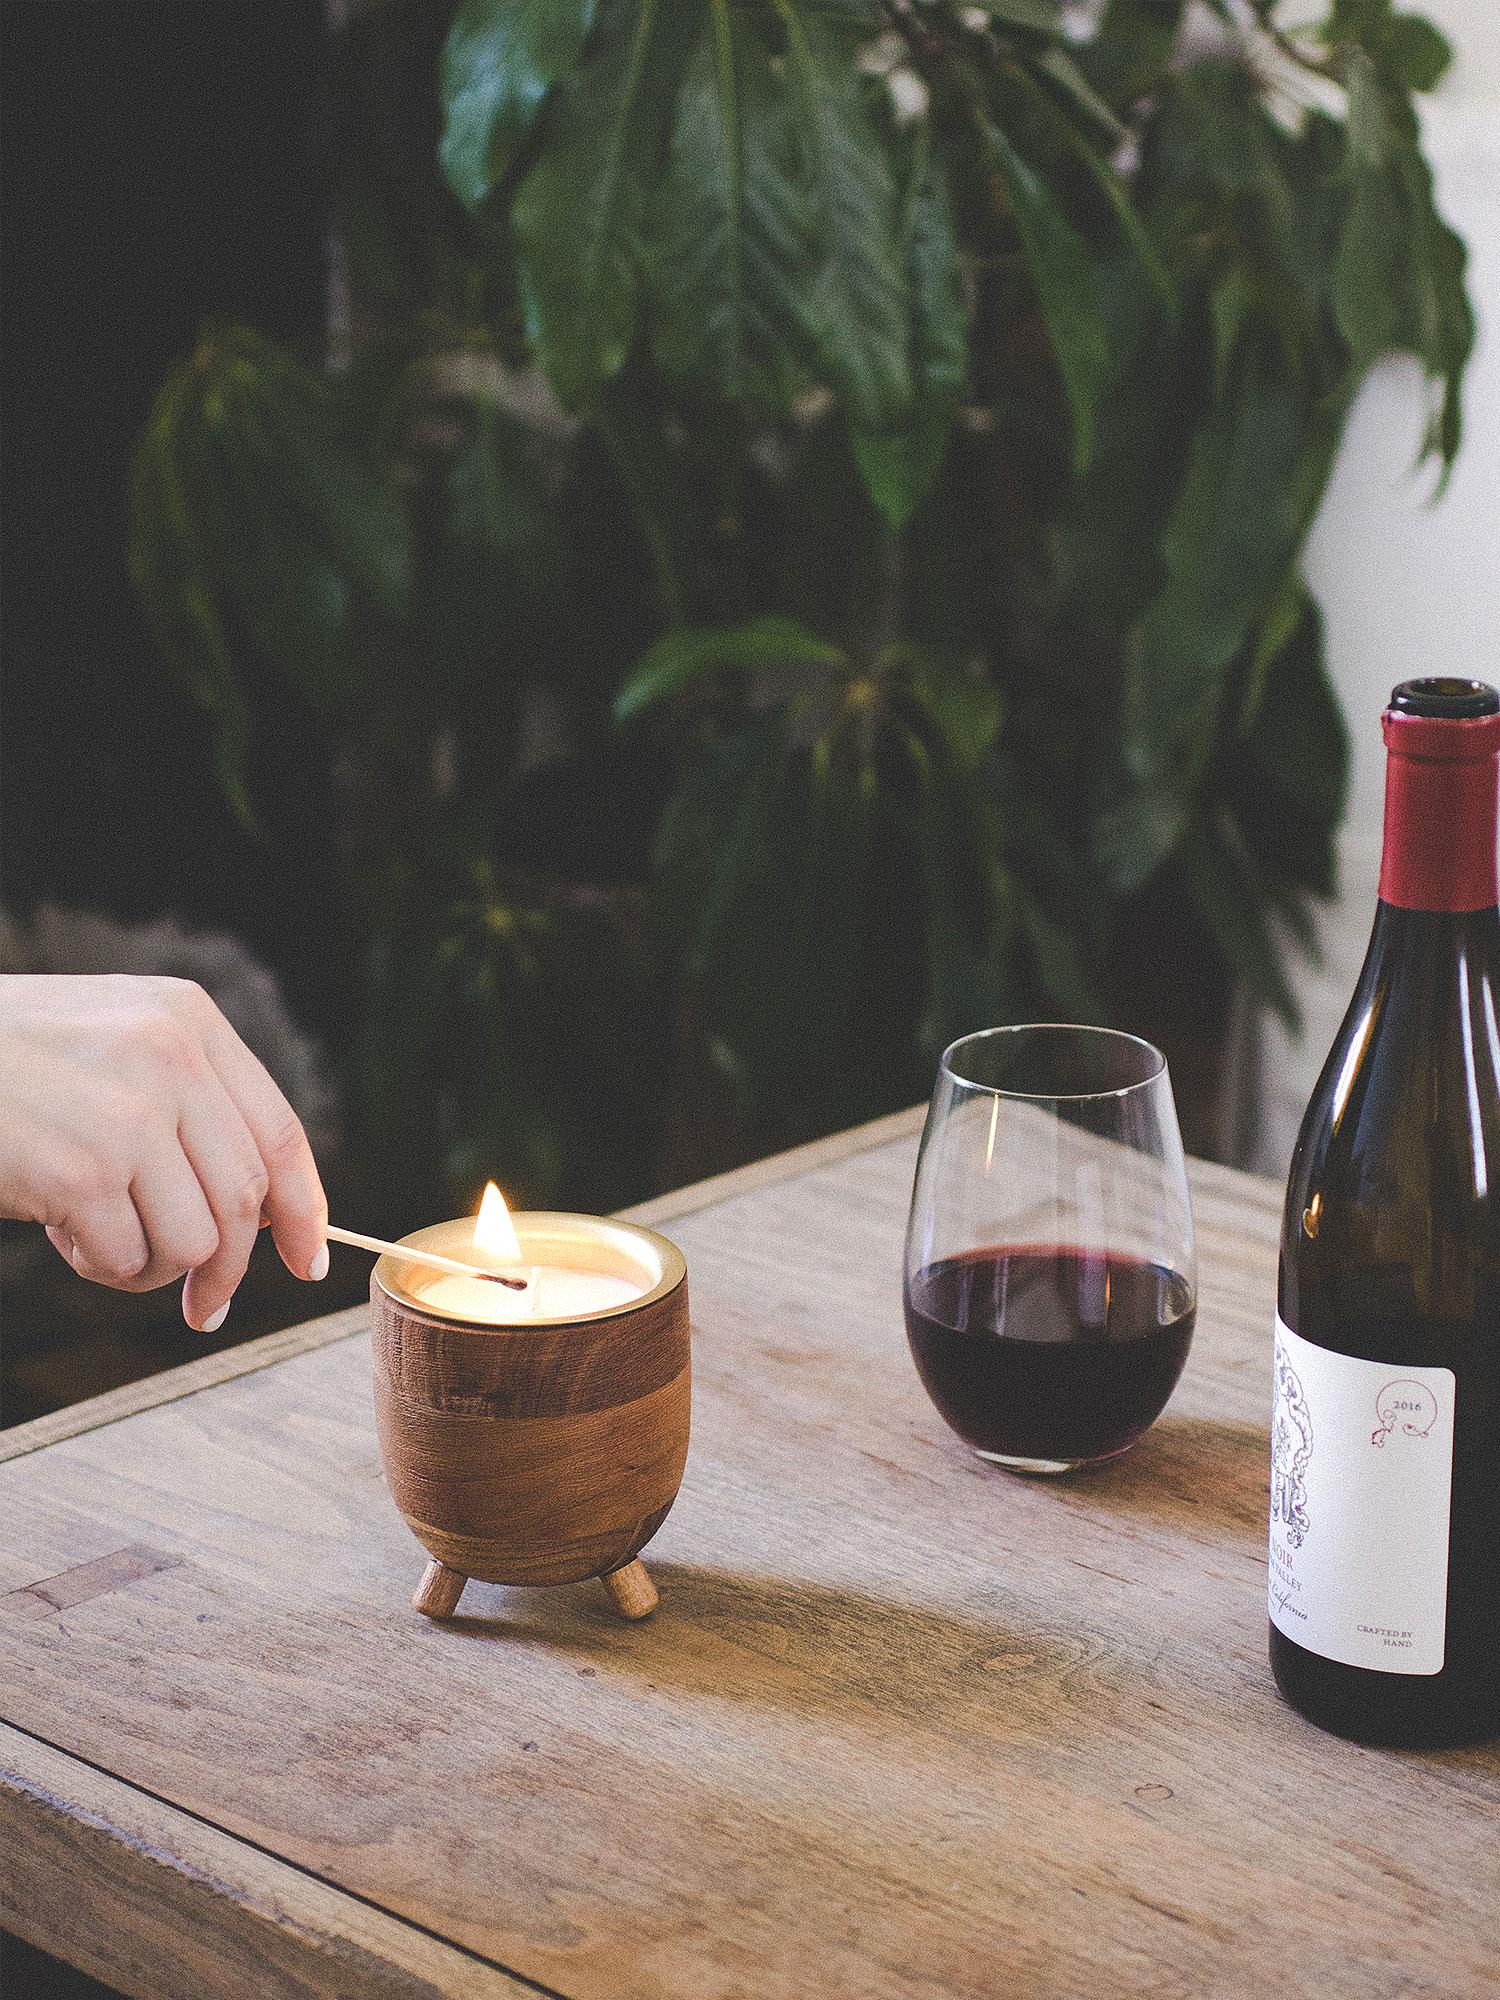 rewined-svicky-barikove-vino